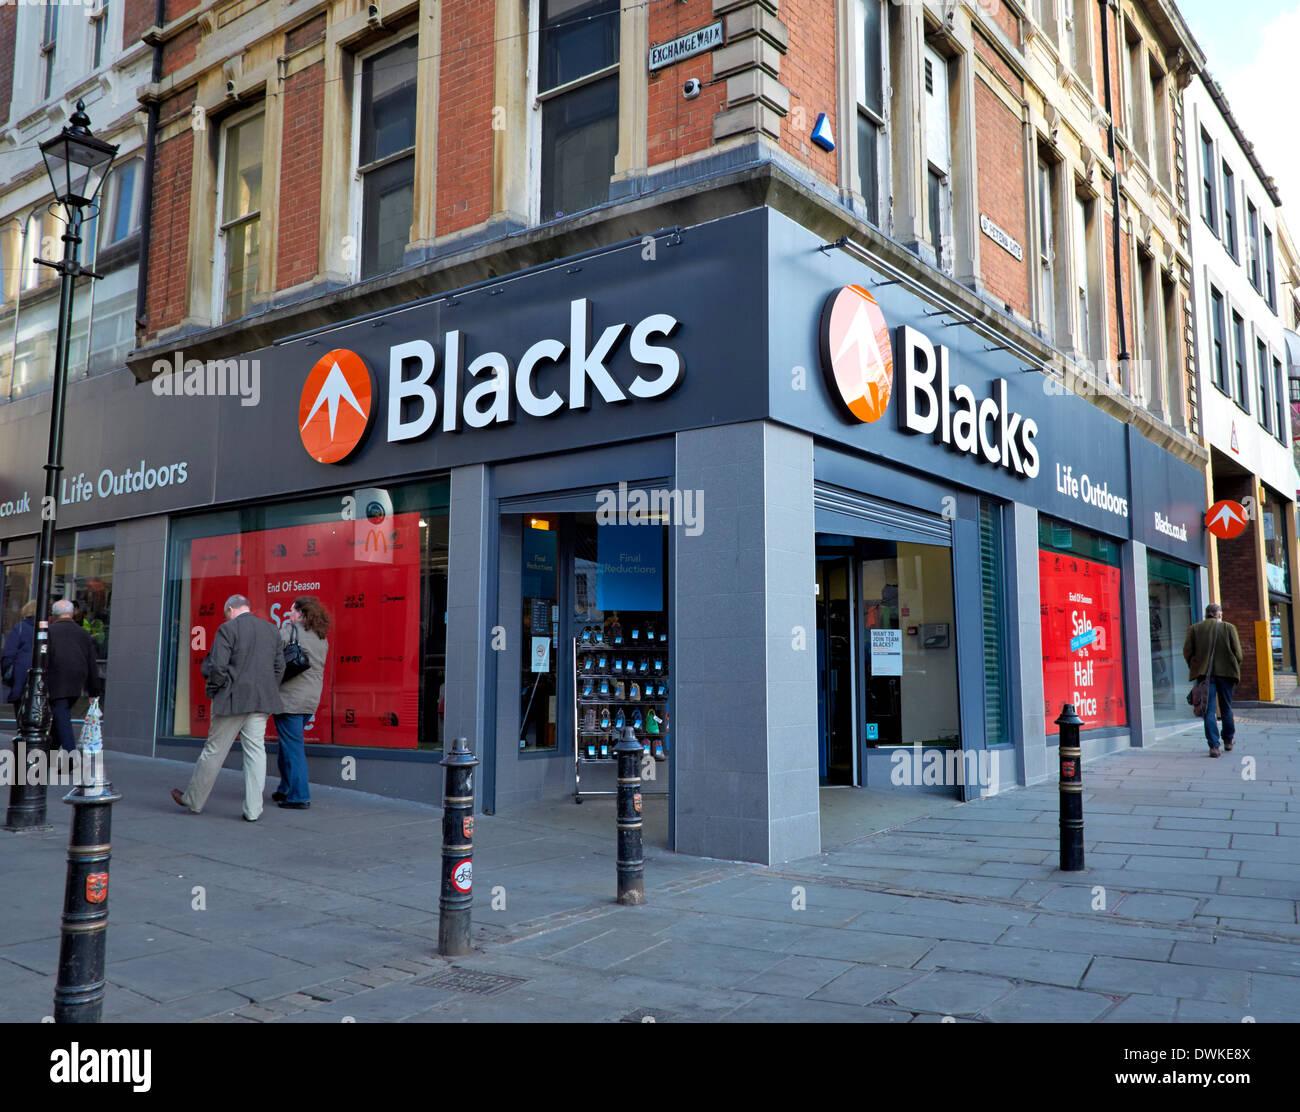 Blacks Outdoor Retailer Nottingham England UK Photo Stock